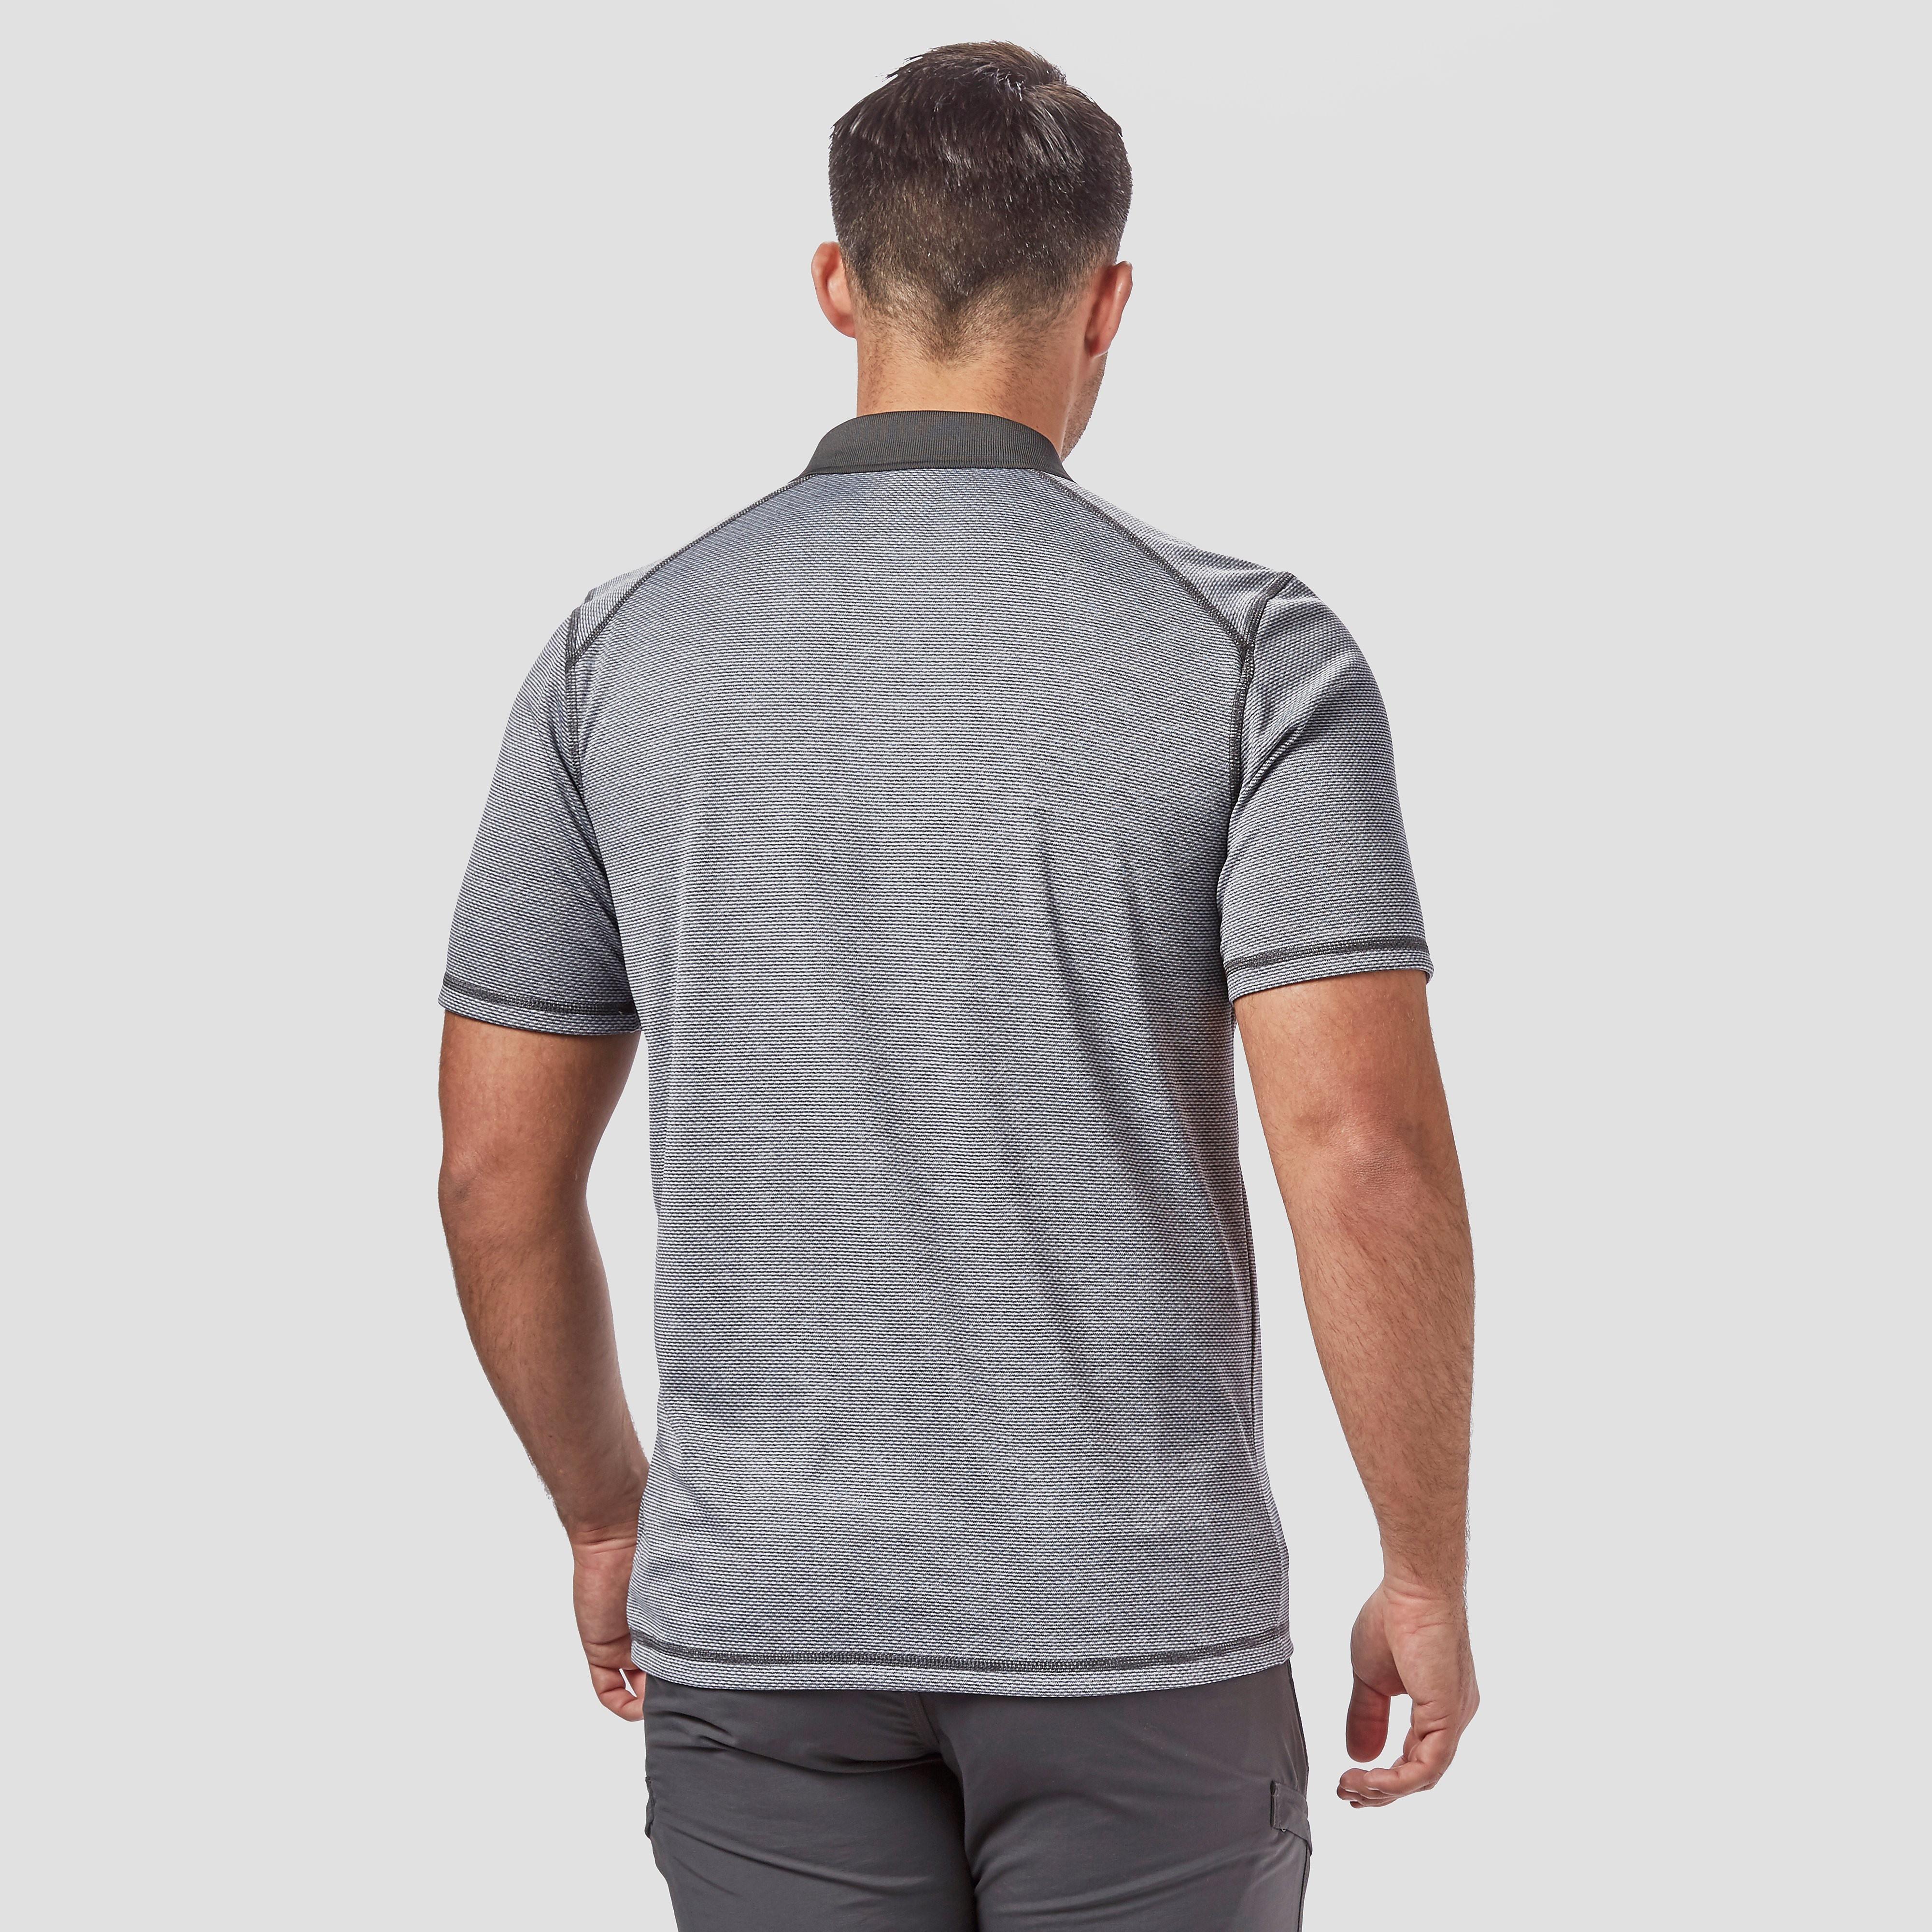 The North Face The Cool Horizon Men's Shirt